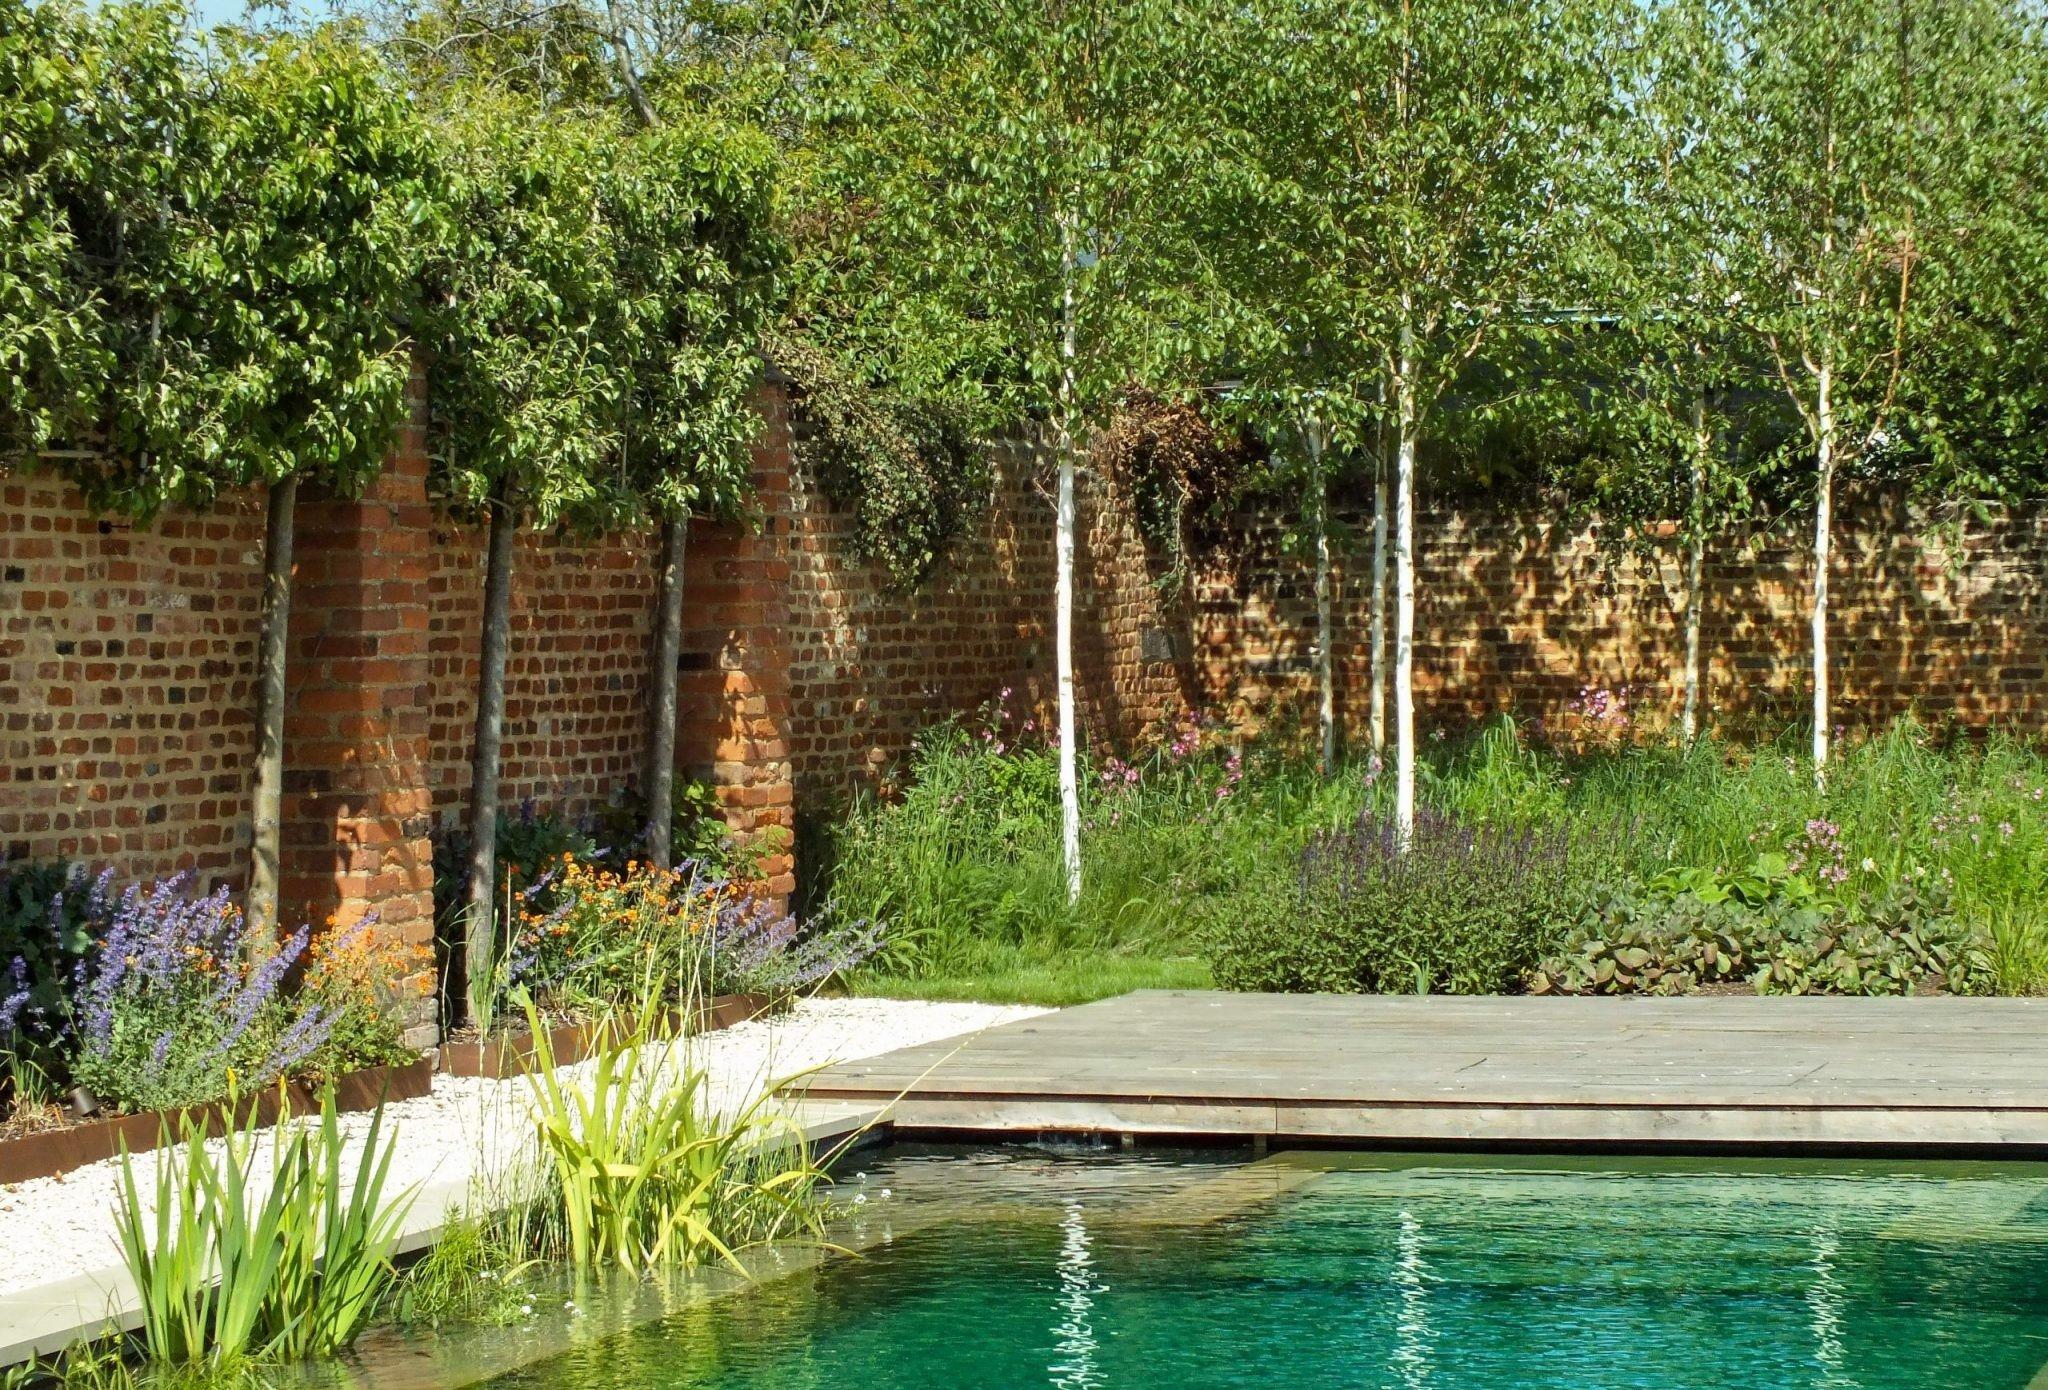 Walled garden next to water feature